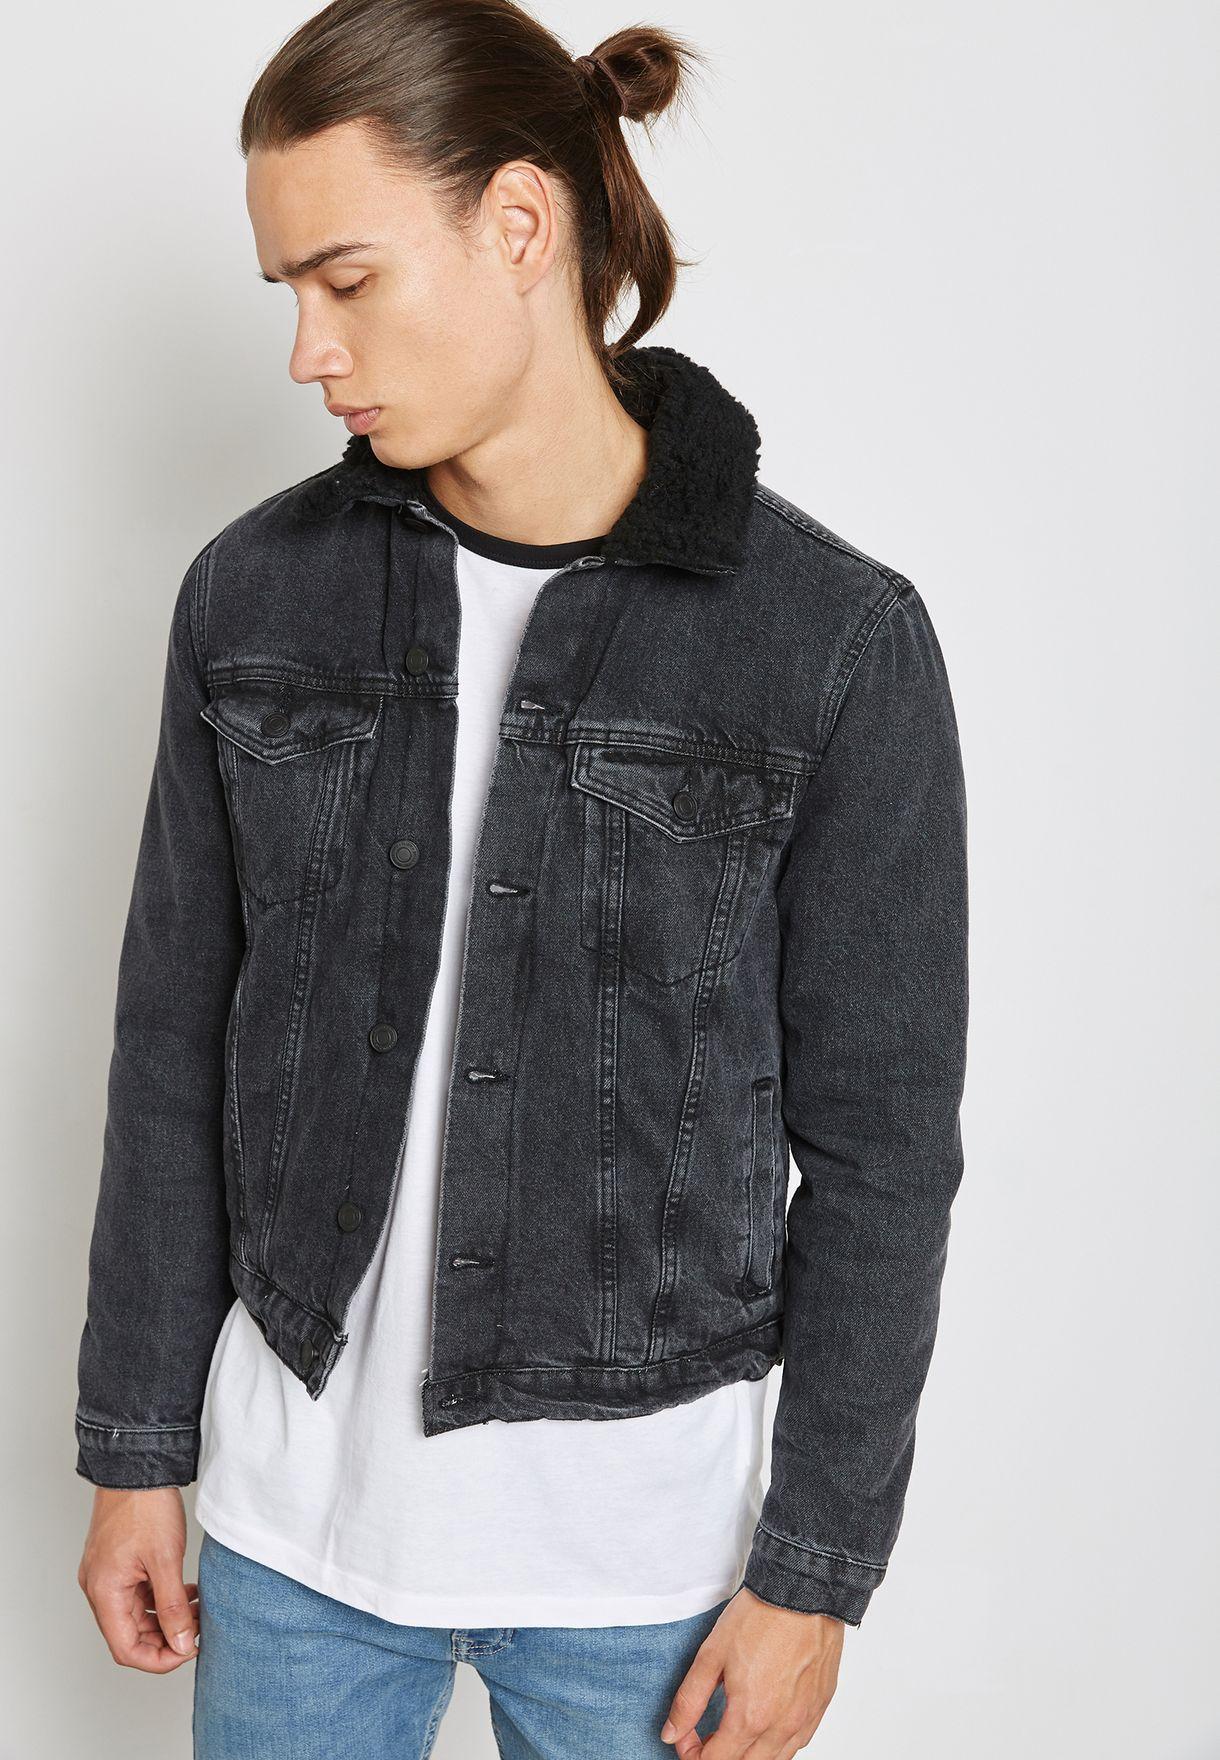 d5d2bd2d4 Shop New Look black Borg Denim Jacket 527758201 for Men in Kuwait ...